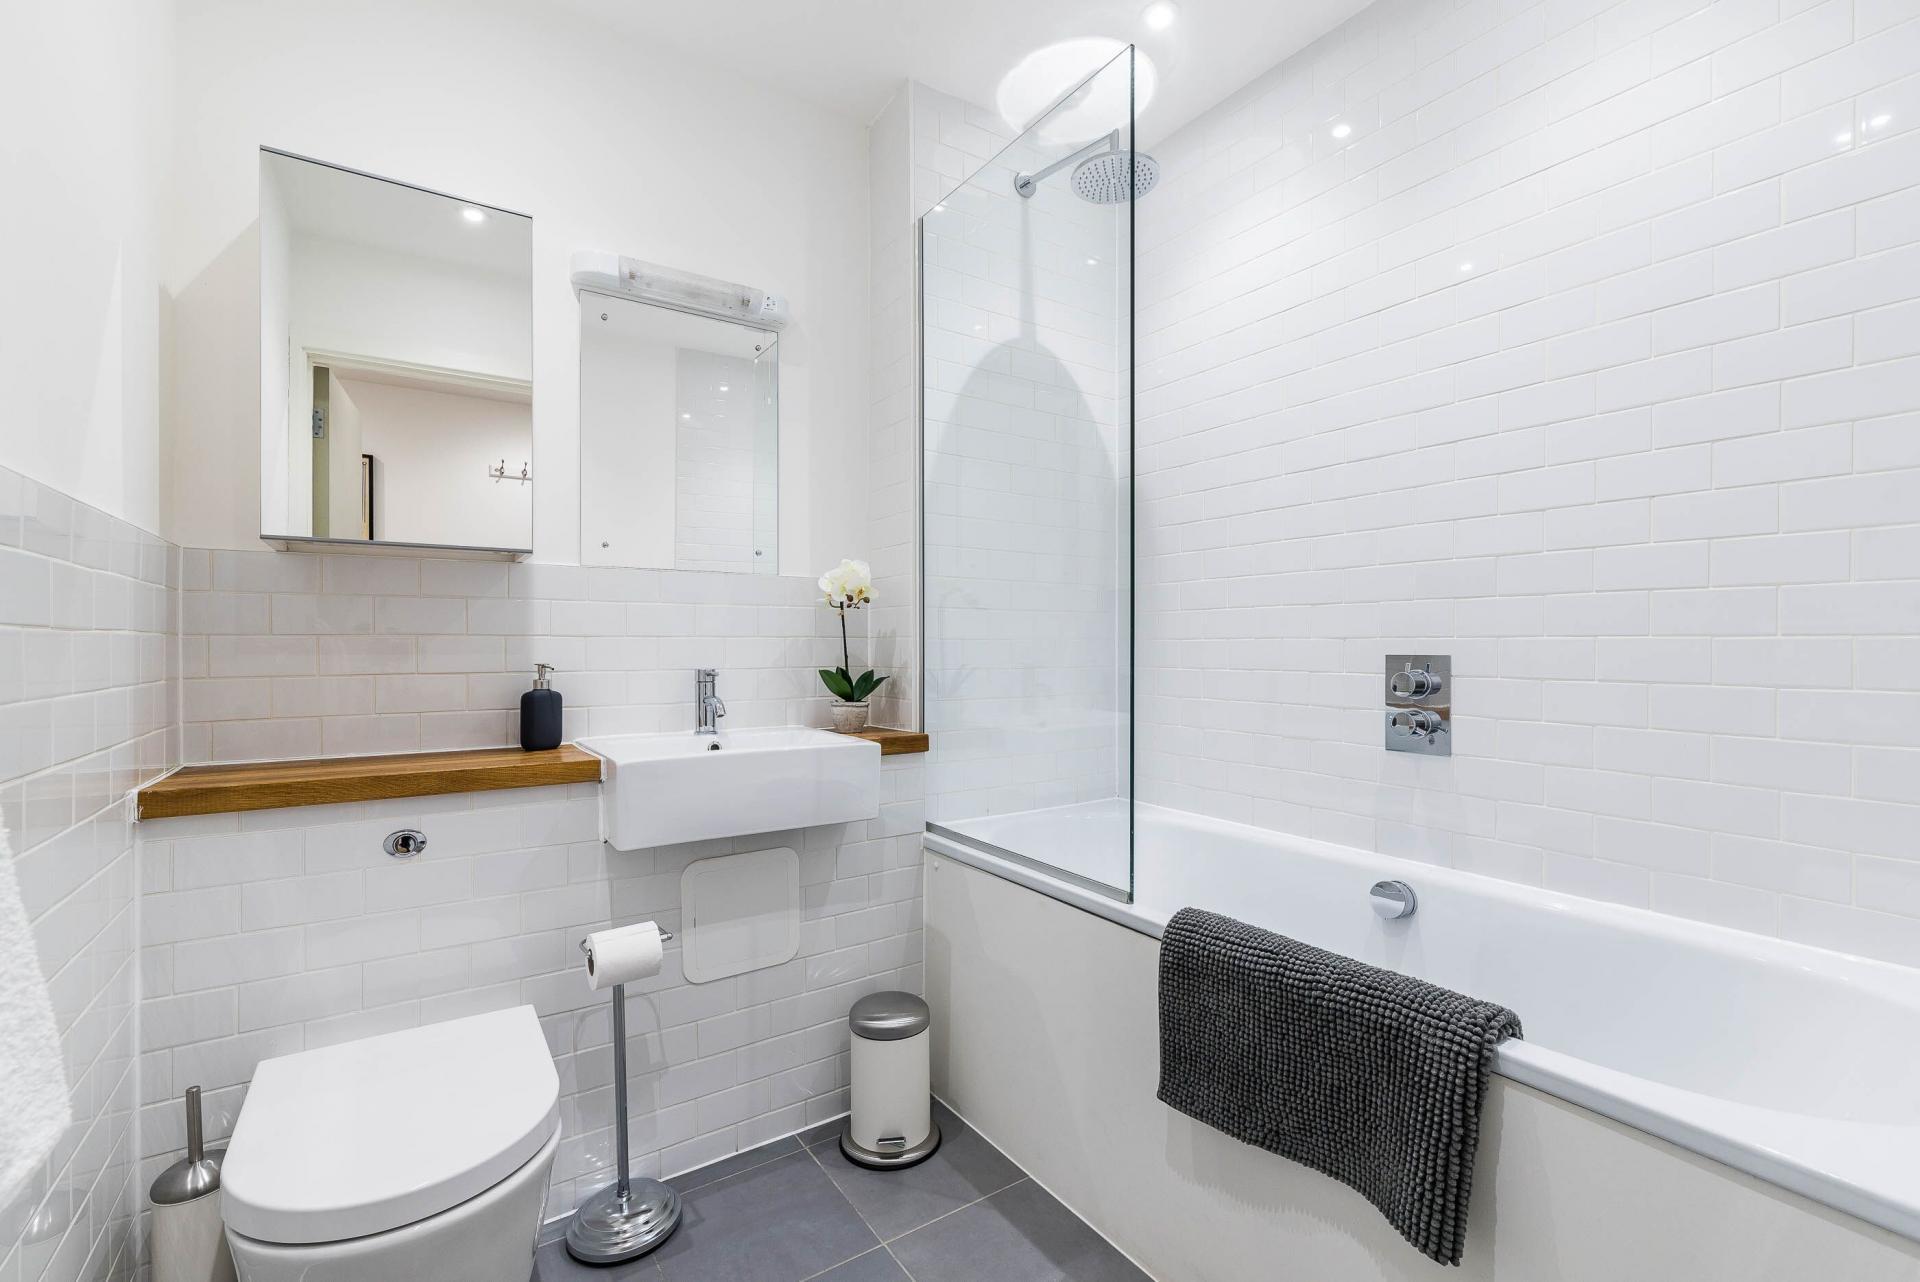 Bathroom at Vibrant Vauxhall Apartments